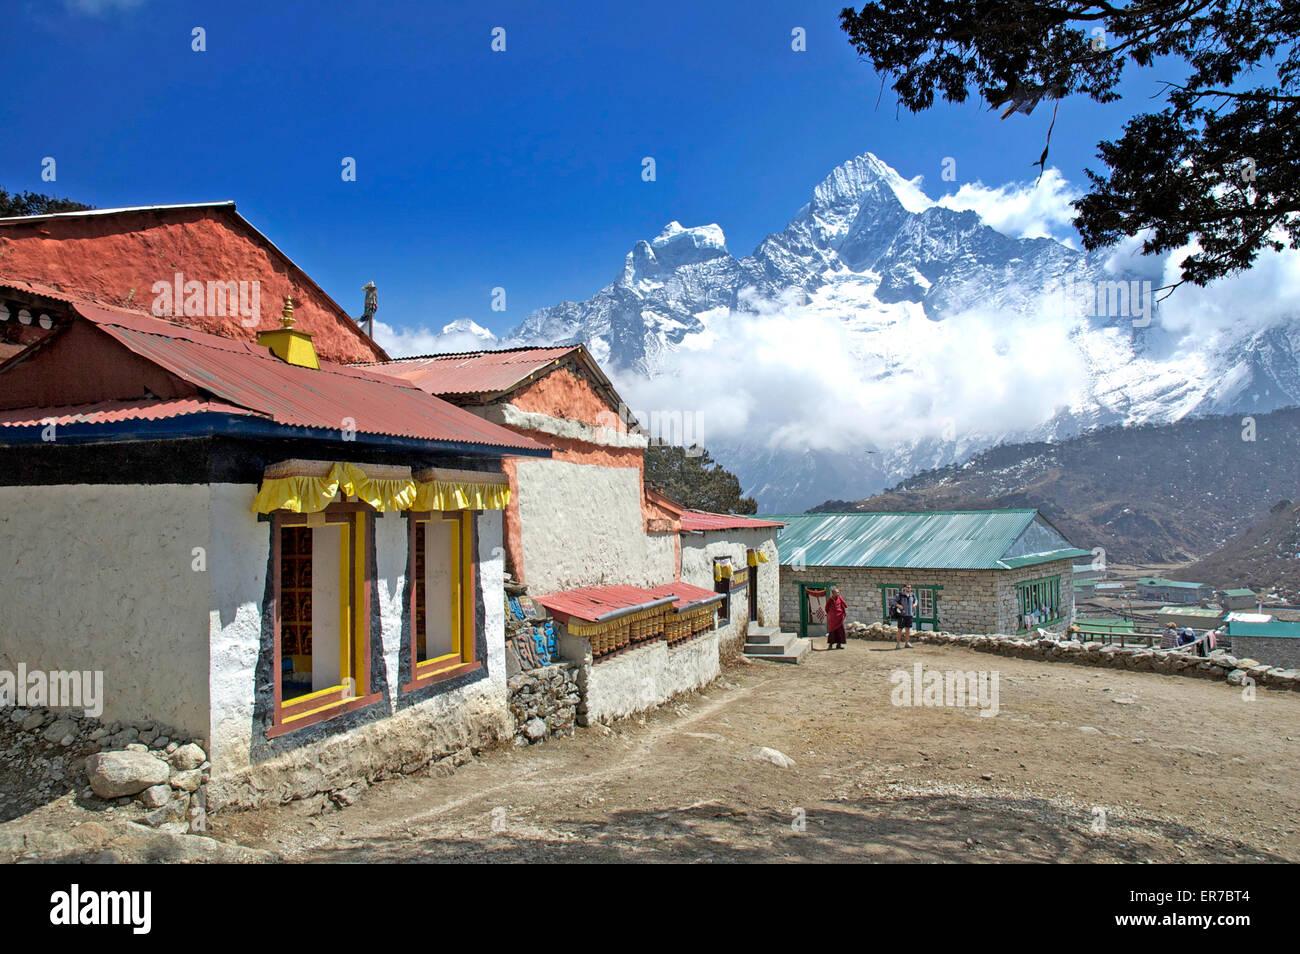 Khumjung Monastery, Khumjung, Nepal. - Stock Image